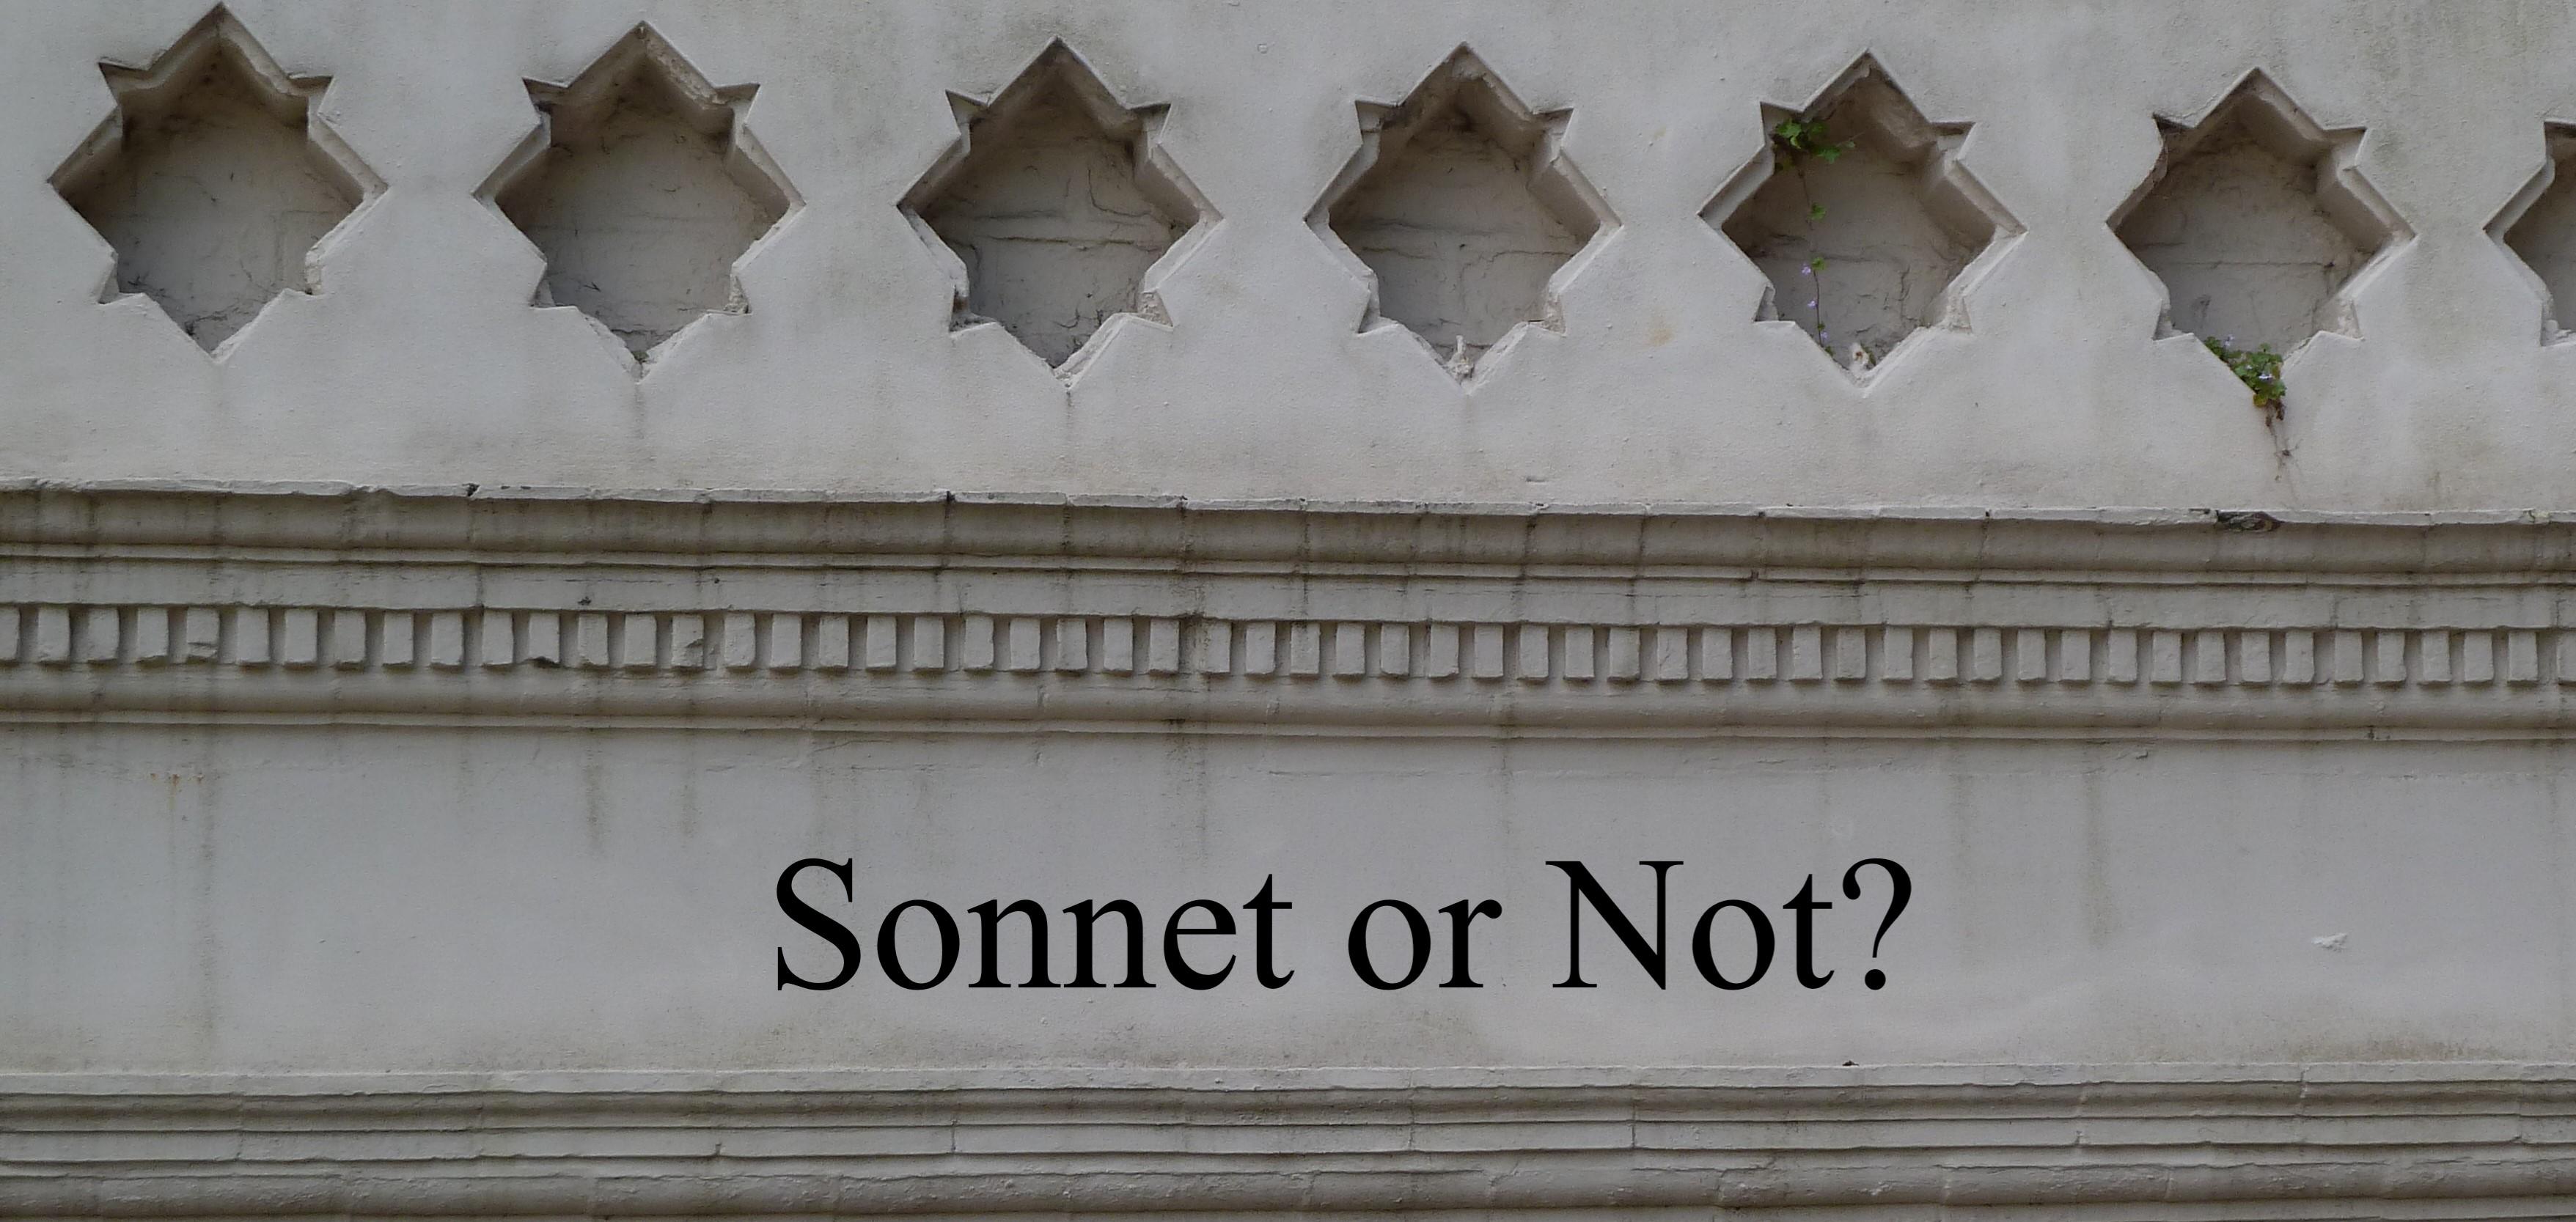 20210730 Sonnet or Not